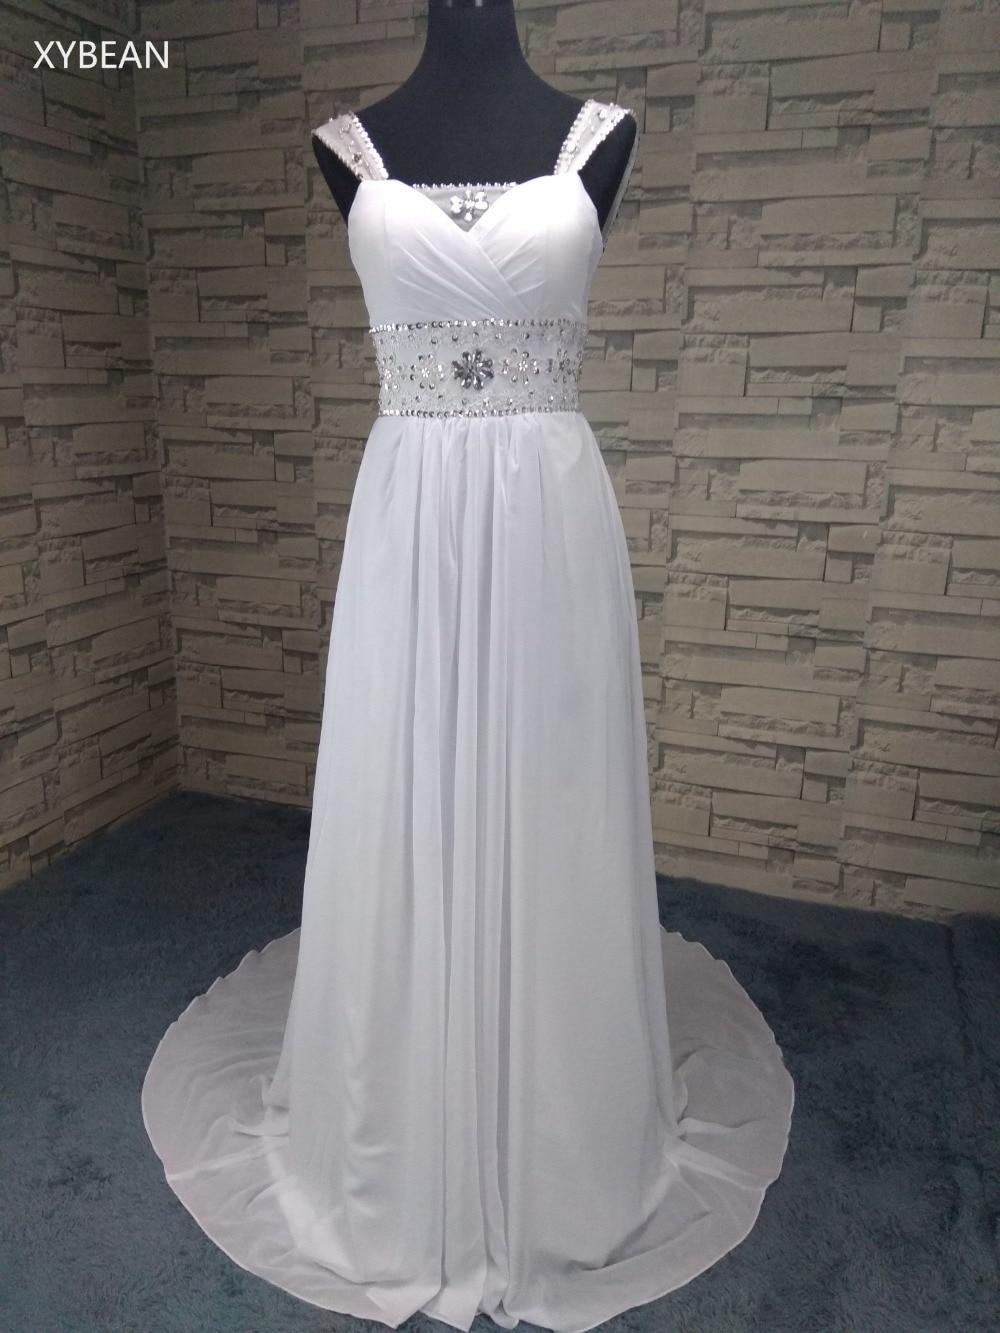 Bebas biaya kirim ! 2018 New Sexy Spaghetti strap Wedding Dresses Manik-manik Chiffon pantai Dengan Kereta FS1003